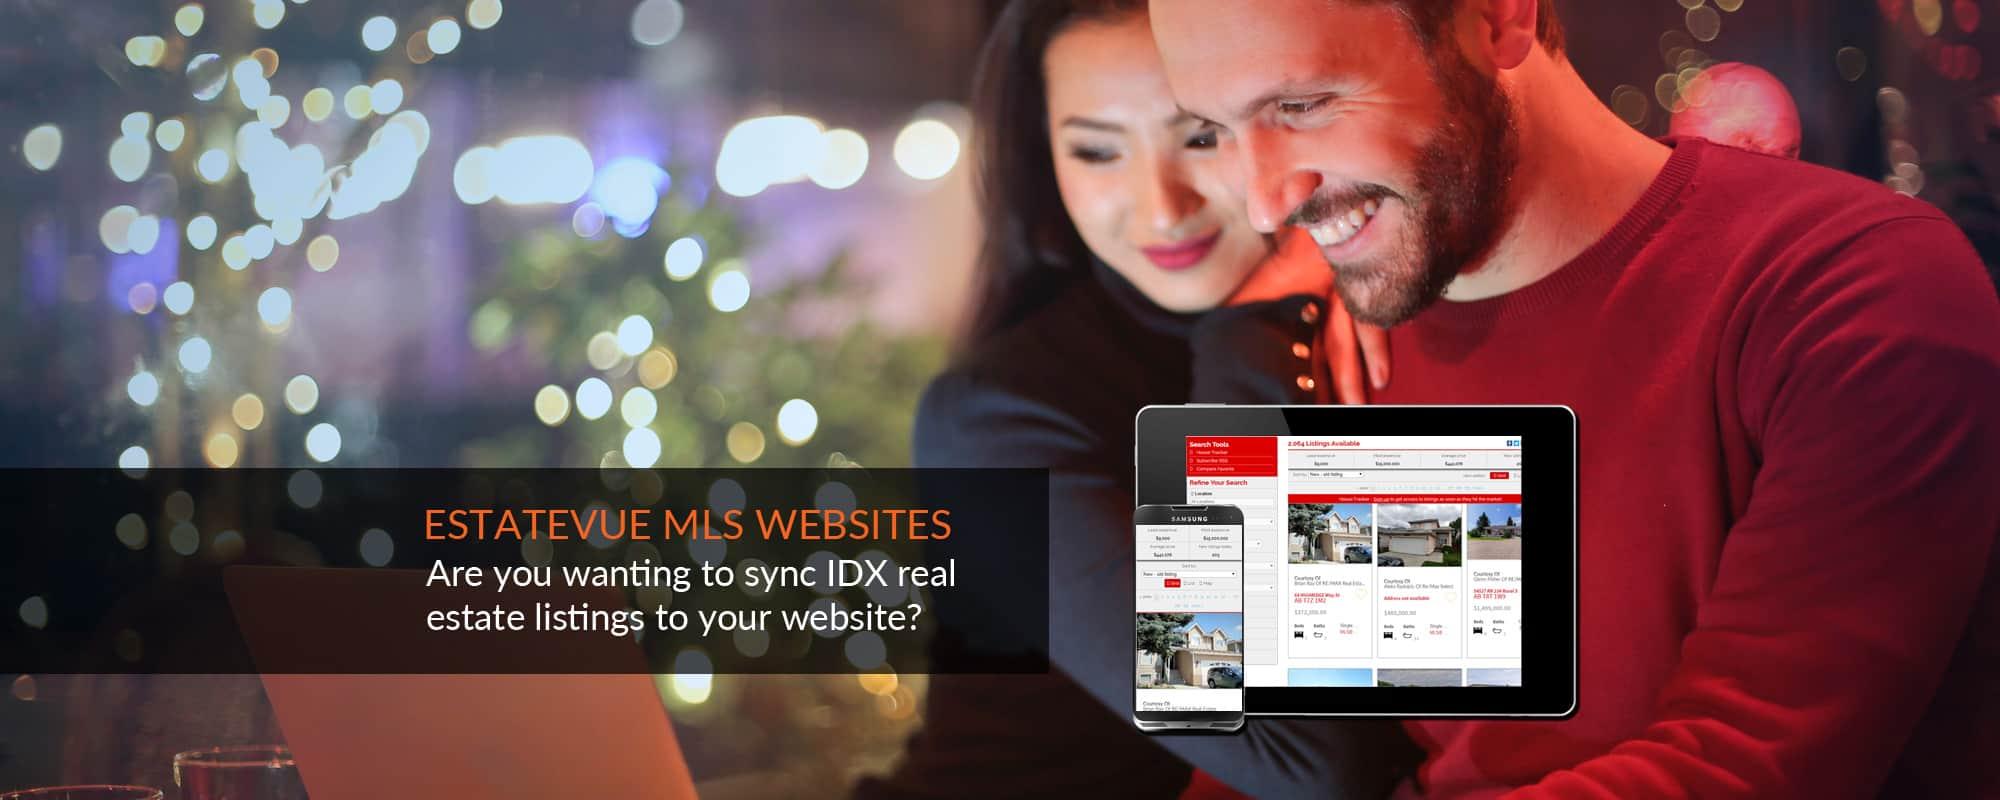 realtor websites,websites for realtors,realtor sites